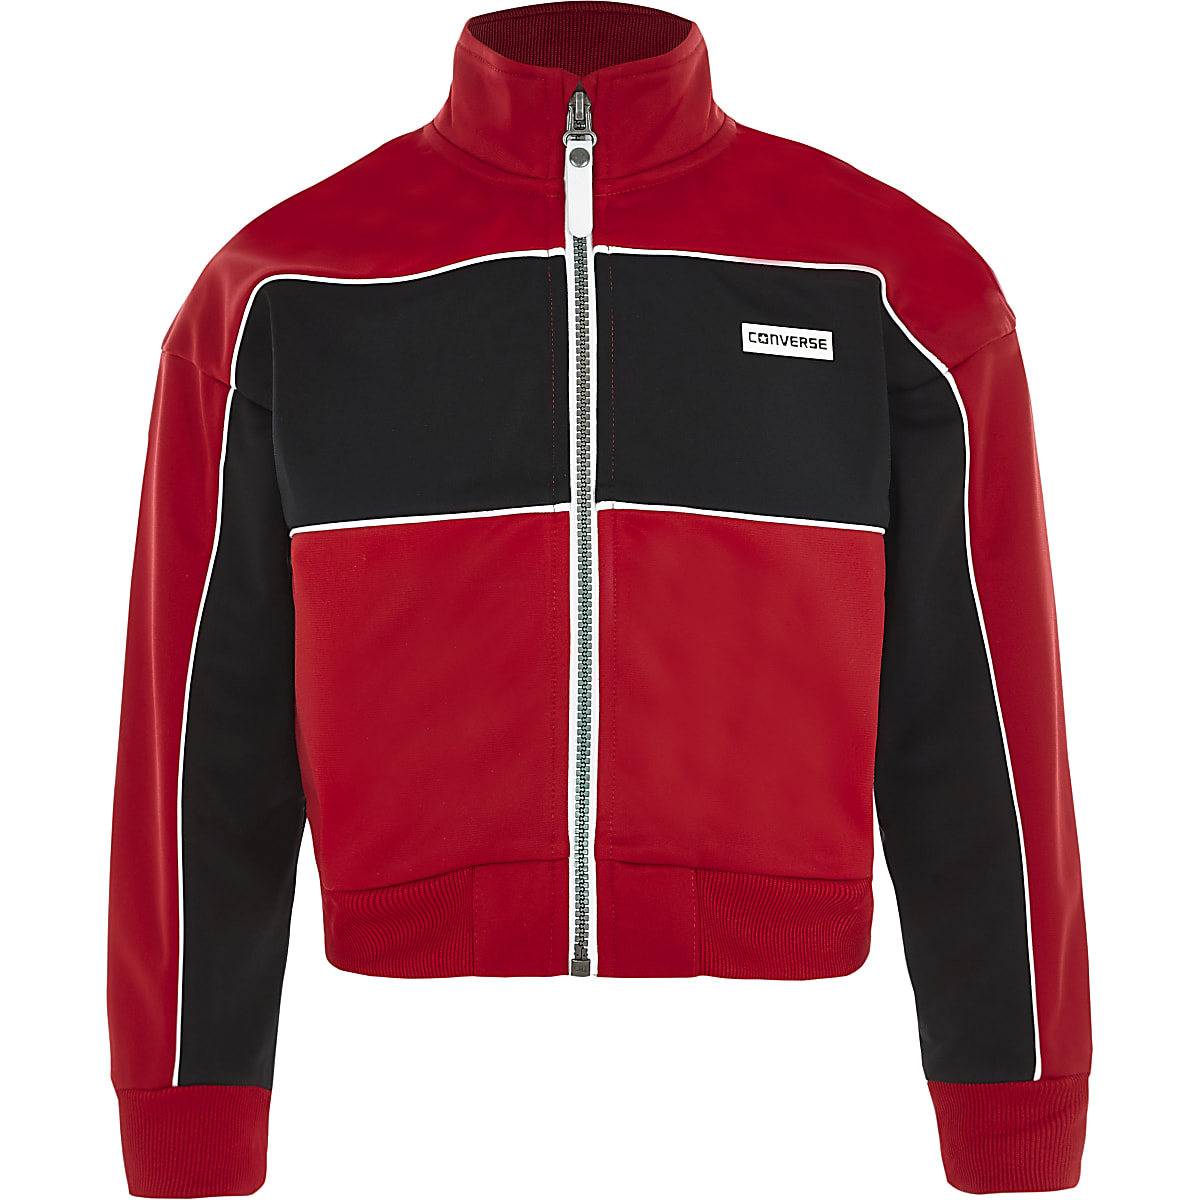 Girls Converse red zip up jacket